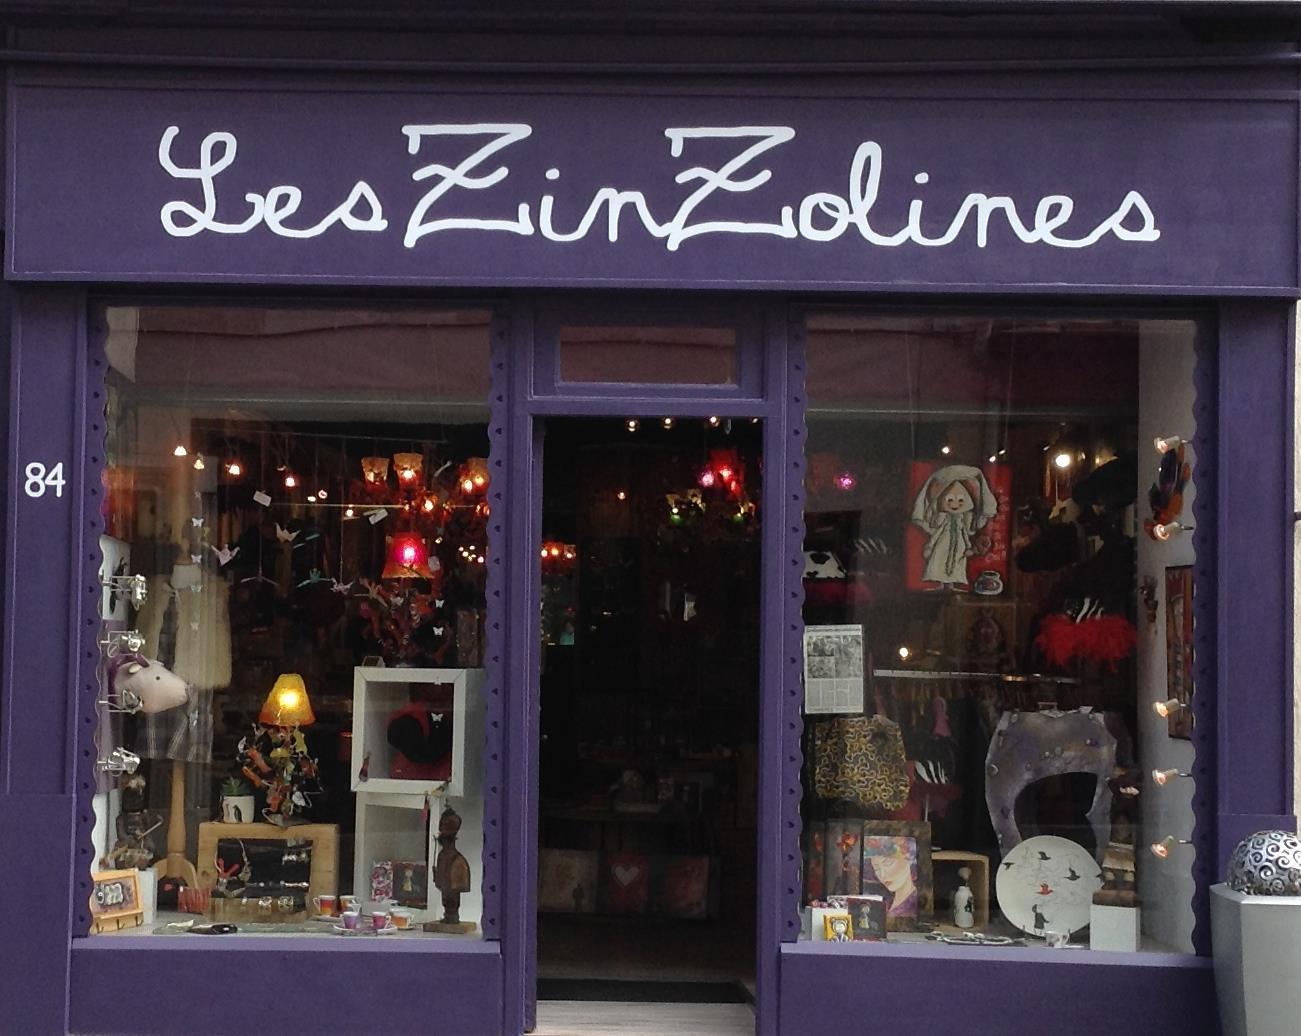 Les Zinzolines 84 grande rue à Nancy